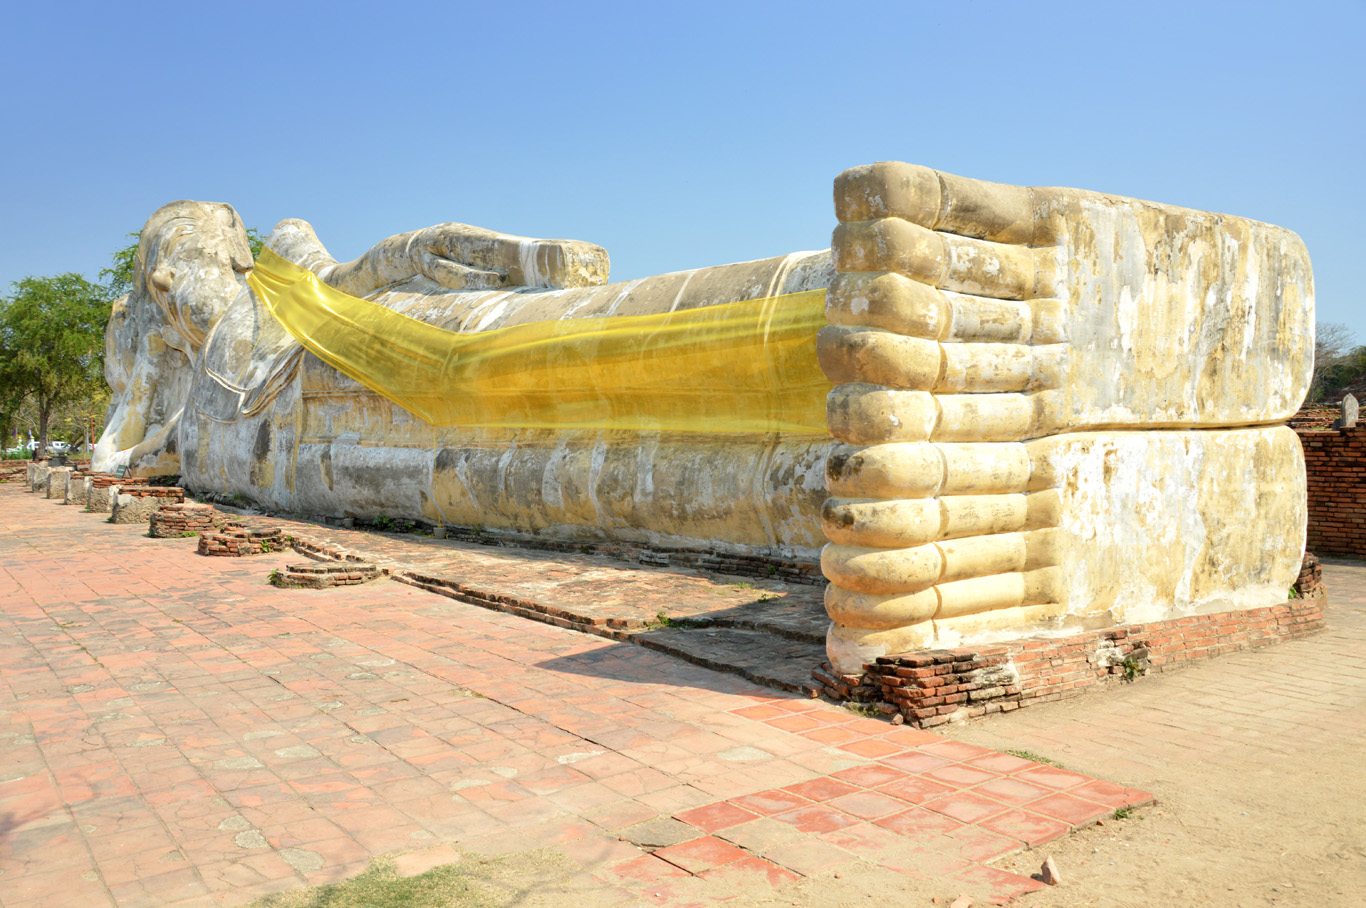 The Reclining Buddha Statue